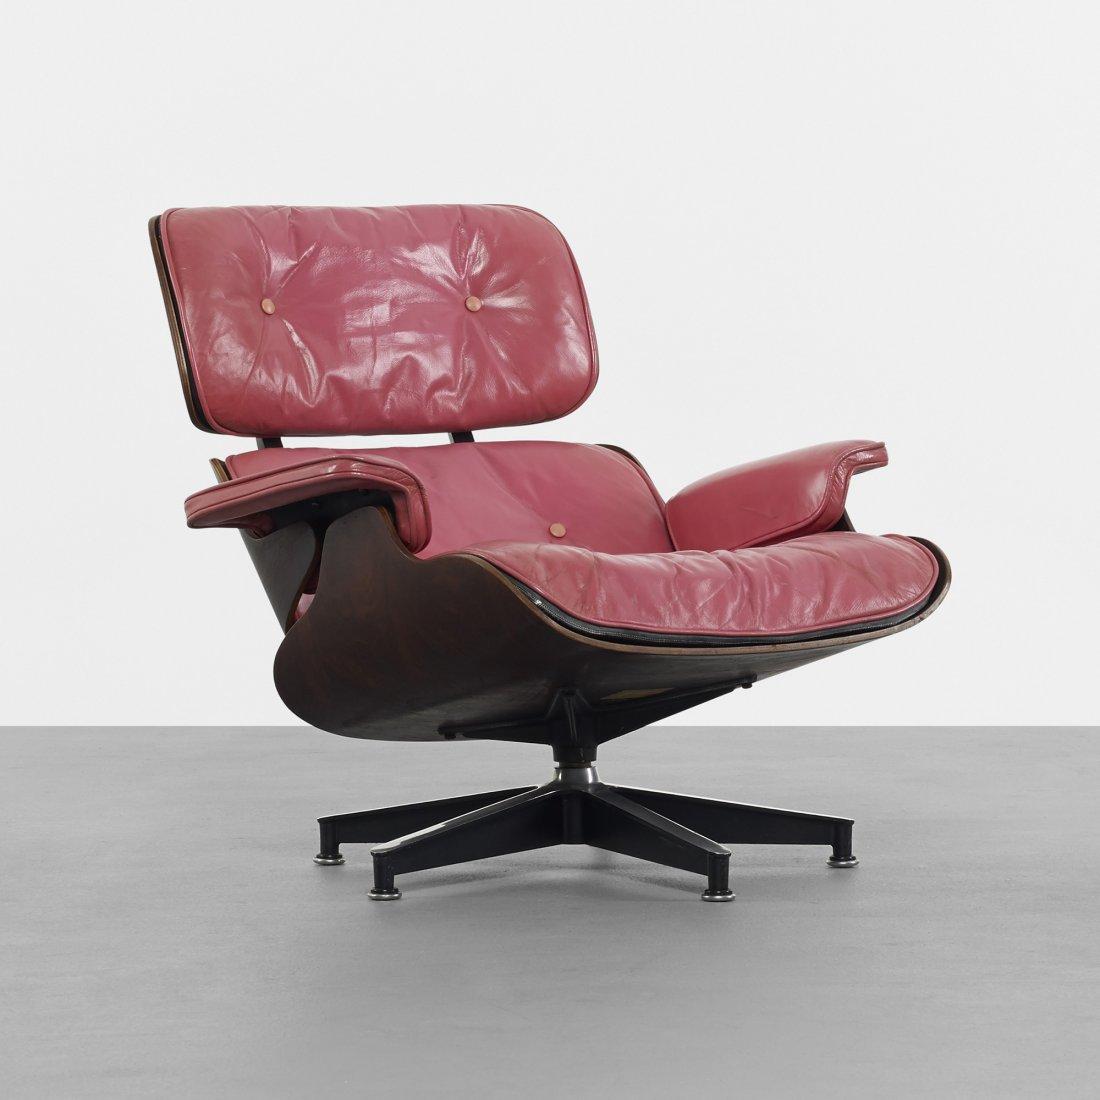 Rare Pink Leather Eames Herman MIller Recliner